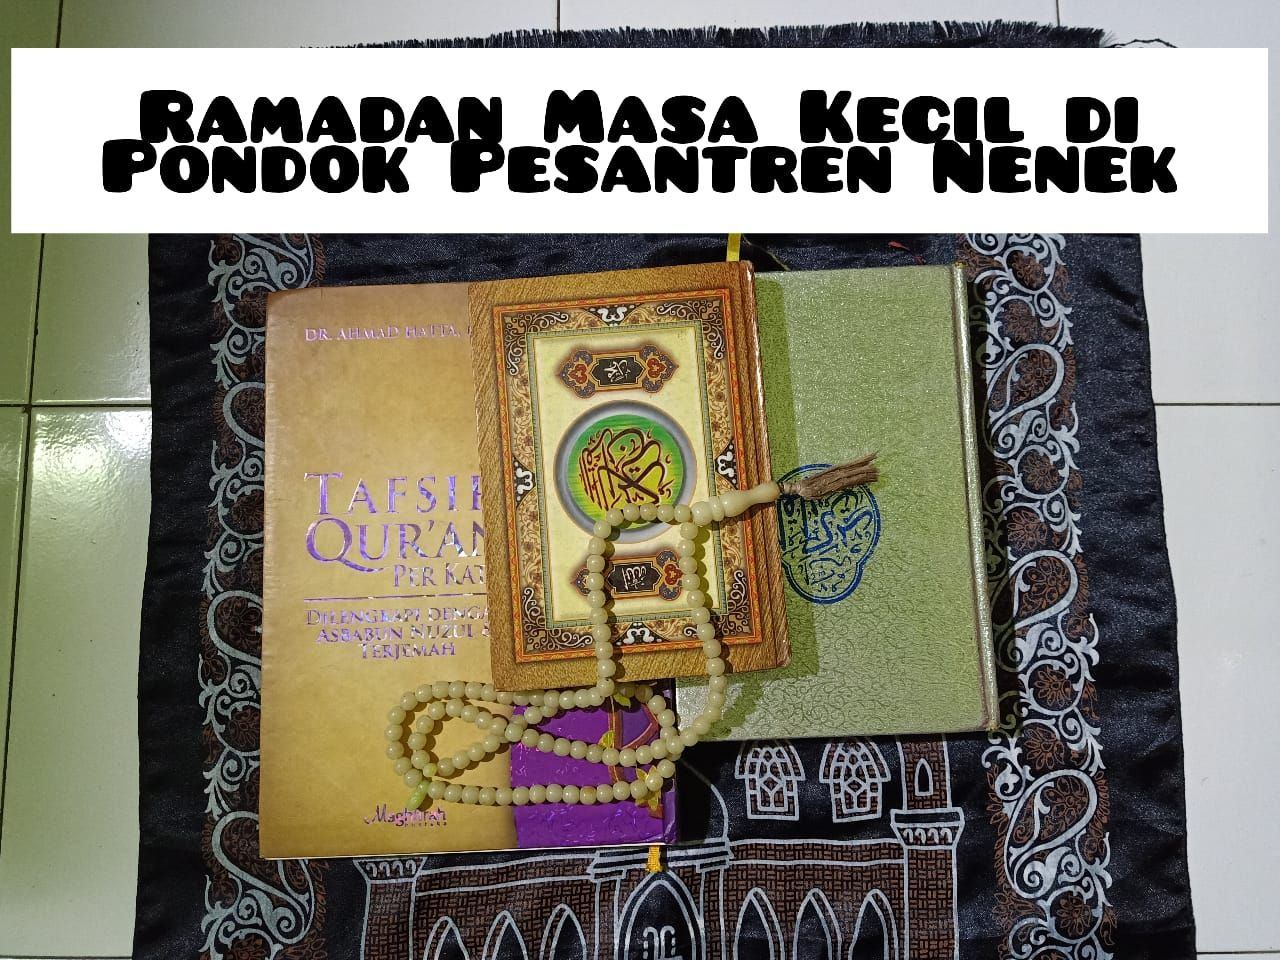 Katam Al Qur'an adalah target dari nenek selama bulan Ramadan (dok.pri)